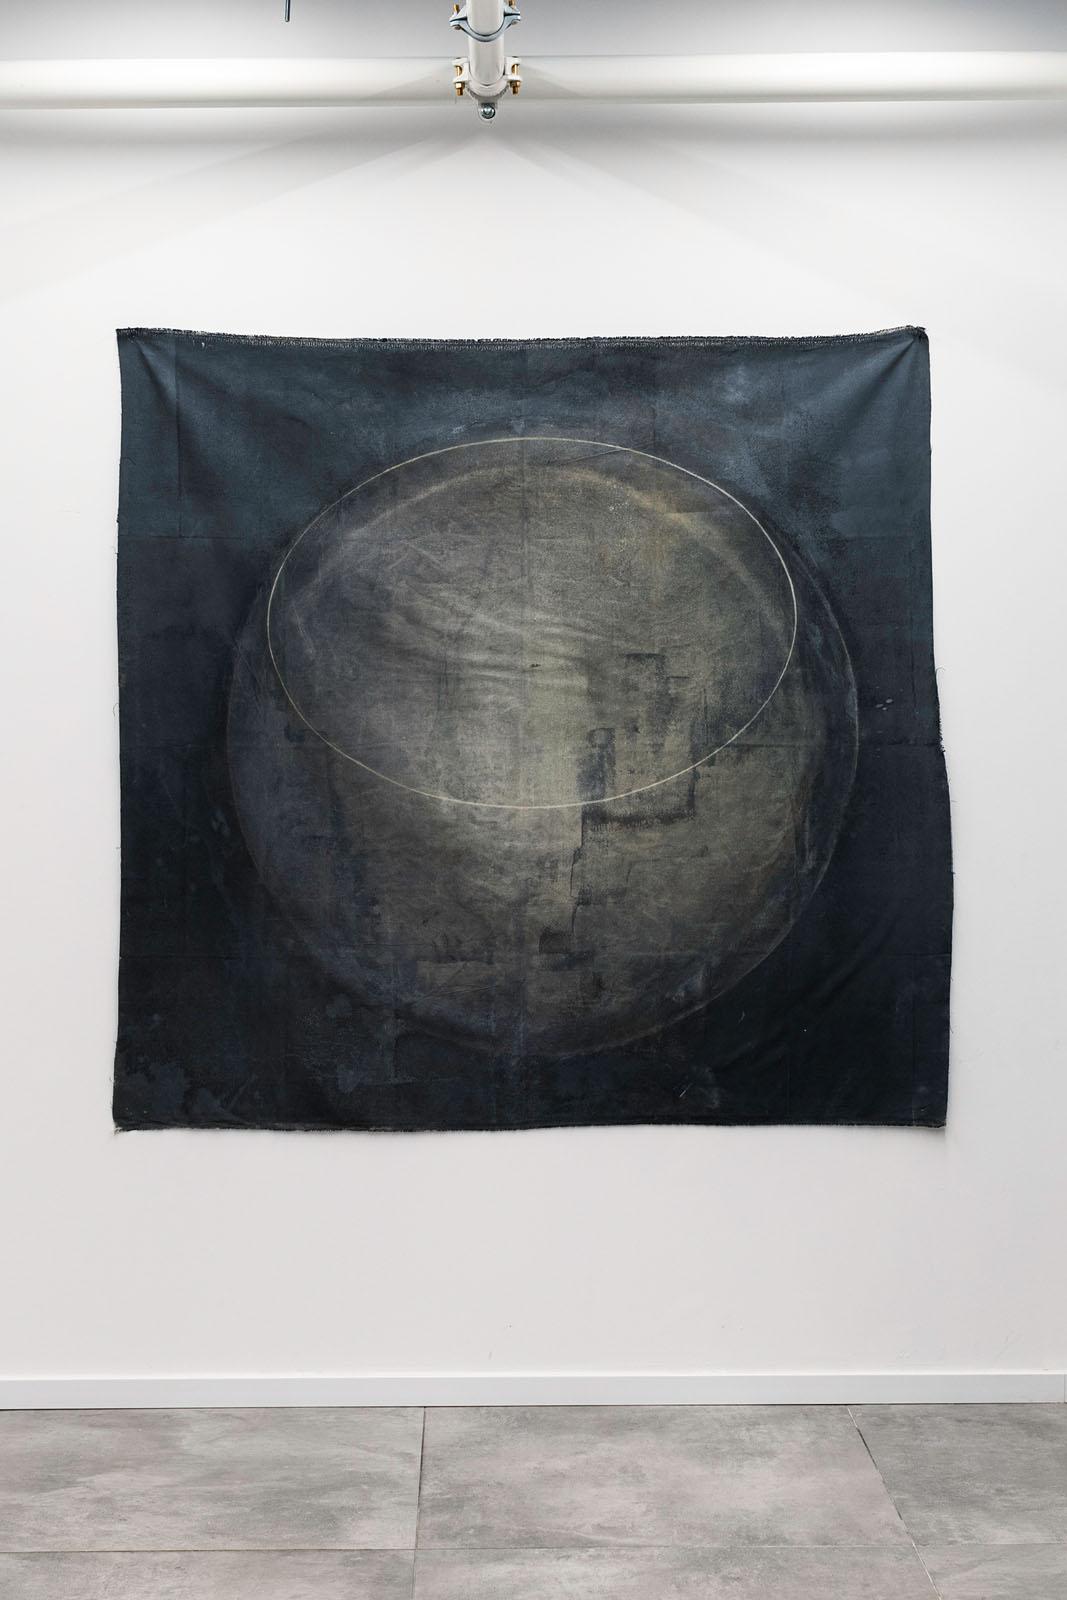 Untiteled, mix media on canvas, 120x120cm